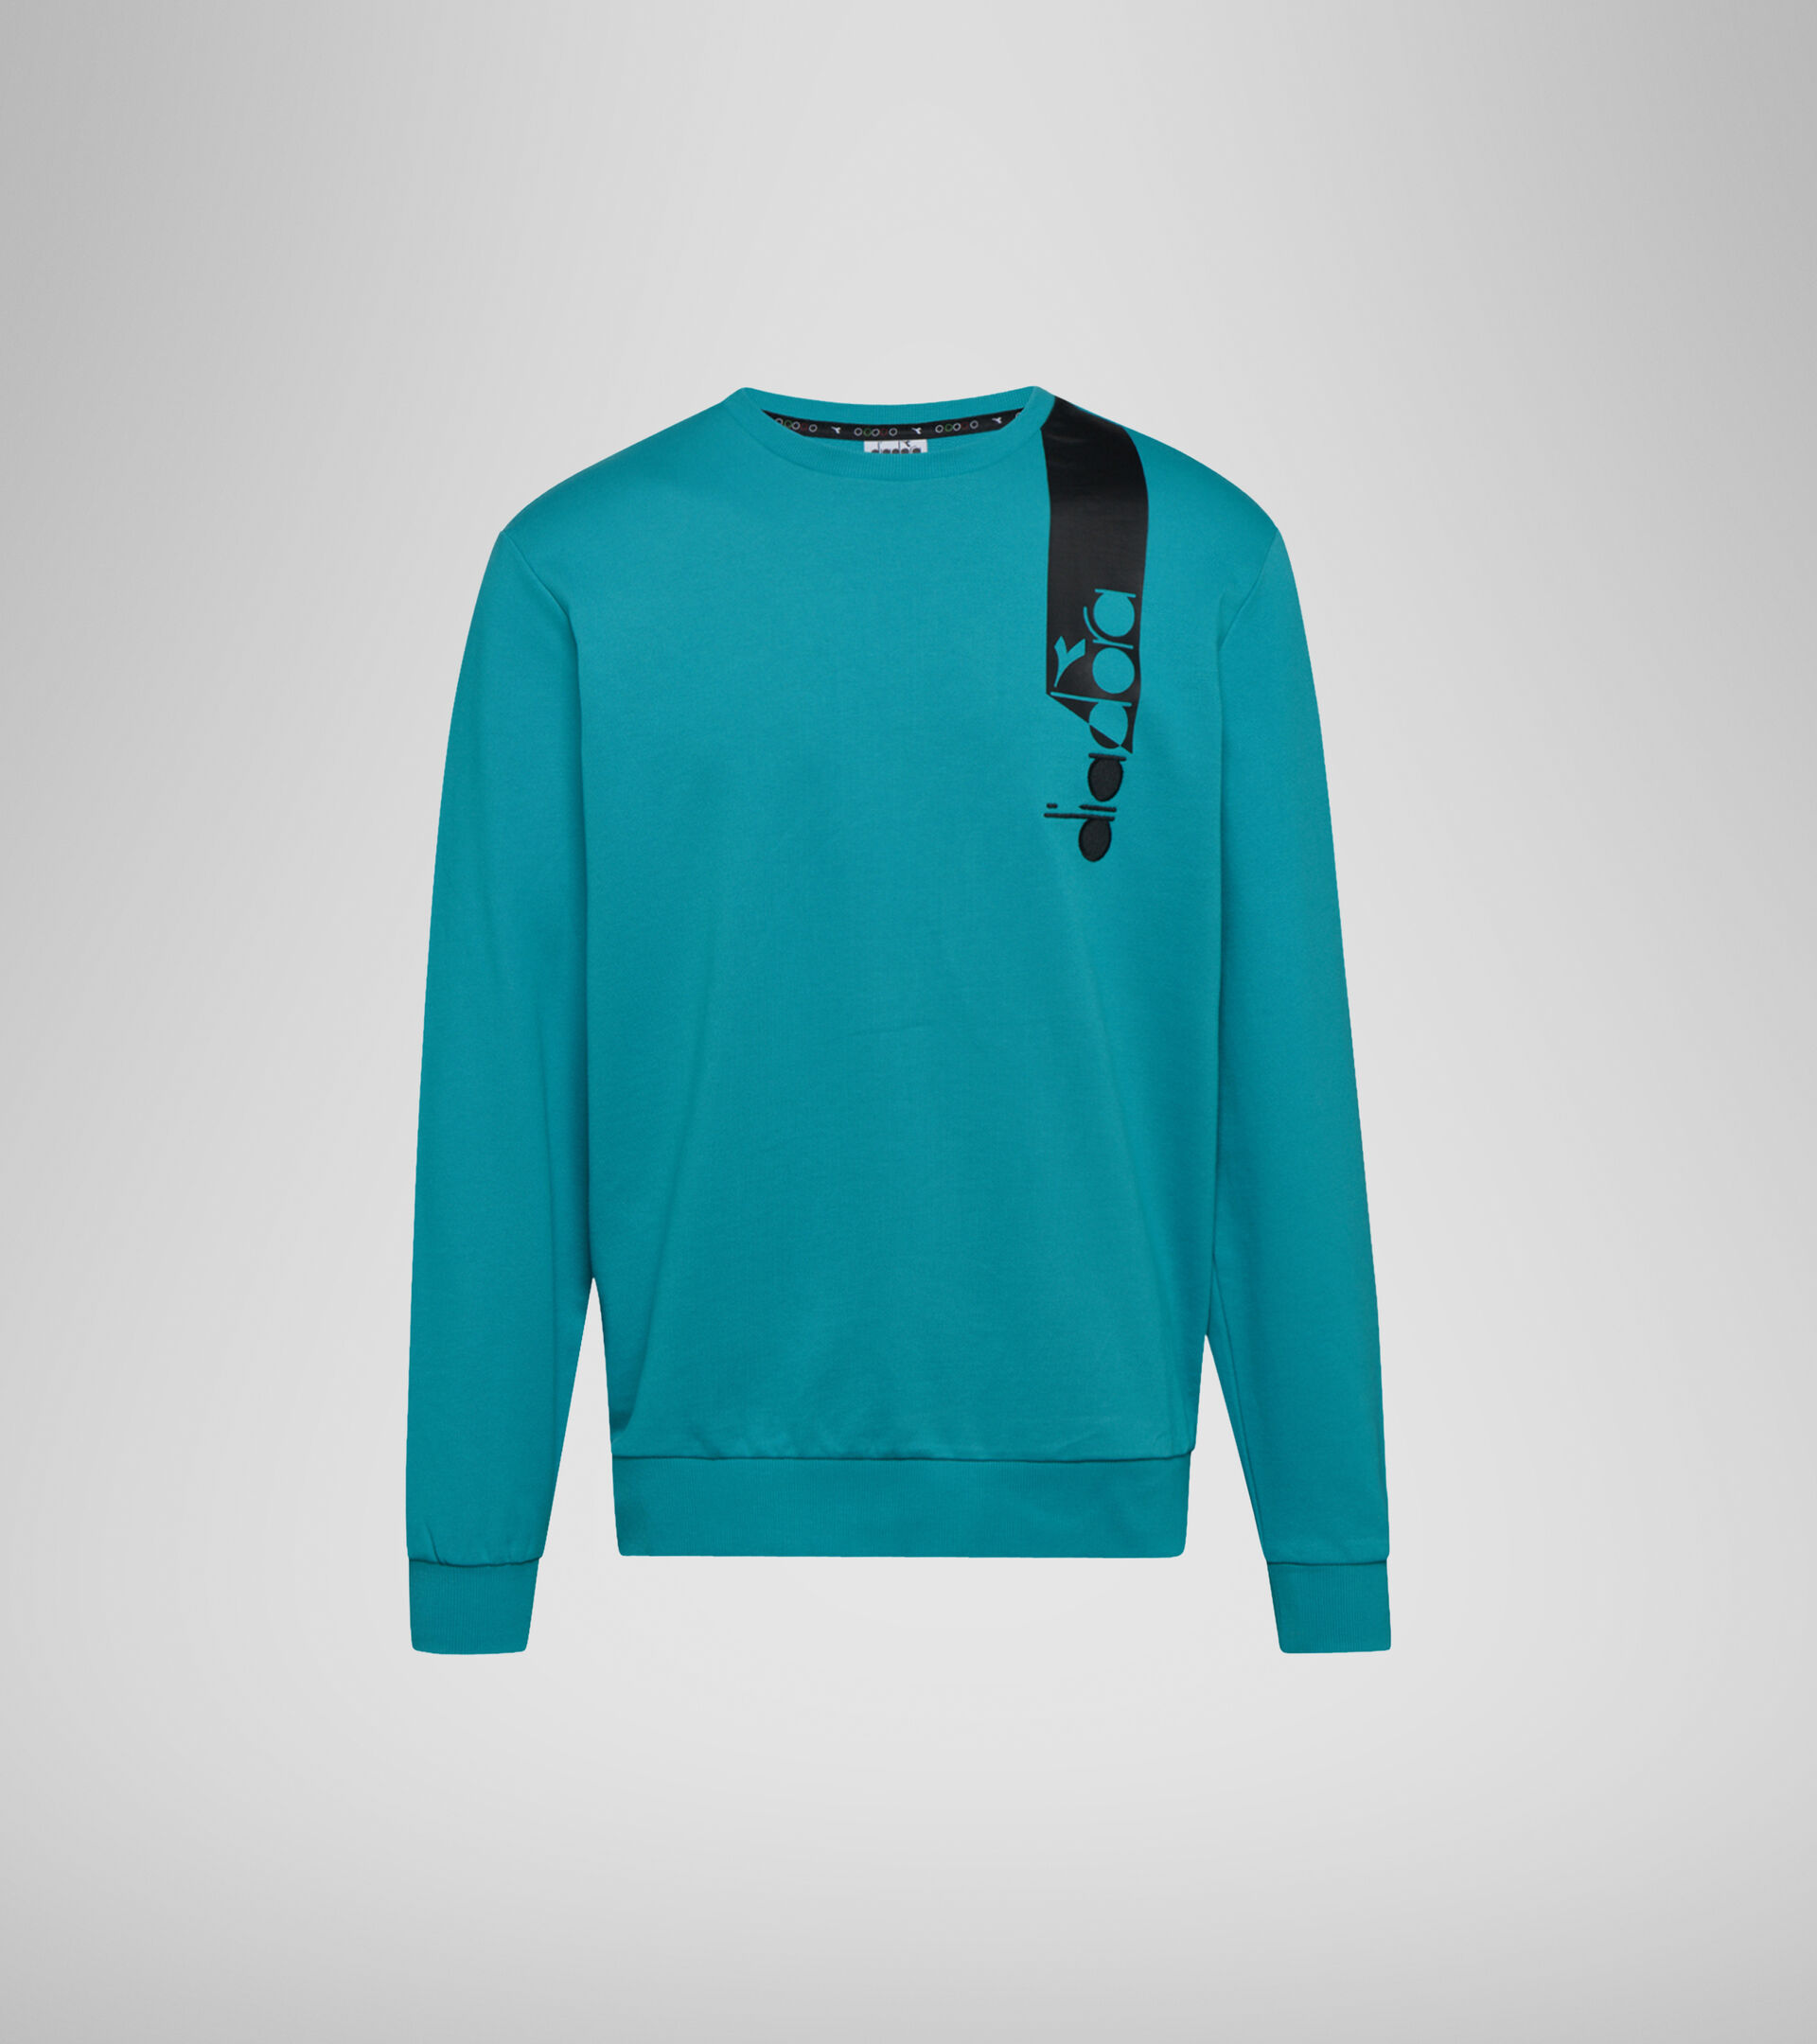 Apparel Sportswear UOMO SWEATSHIRT CREW ICON VERDE VIRIDIAN Diadora